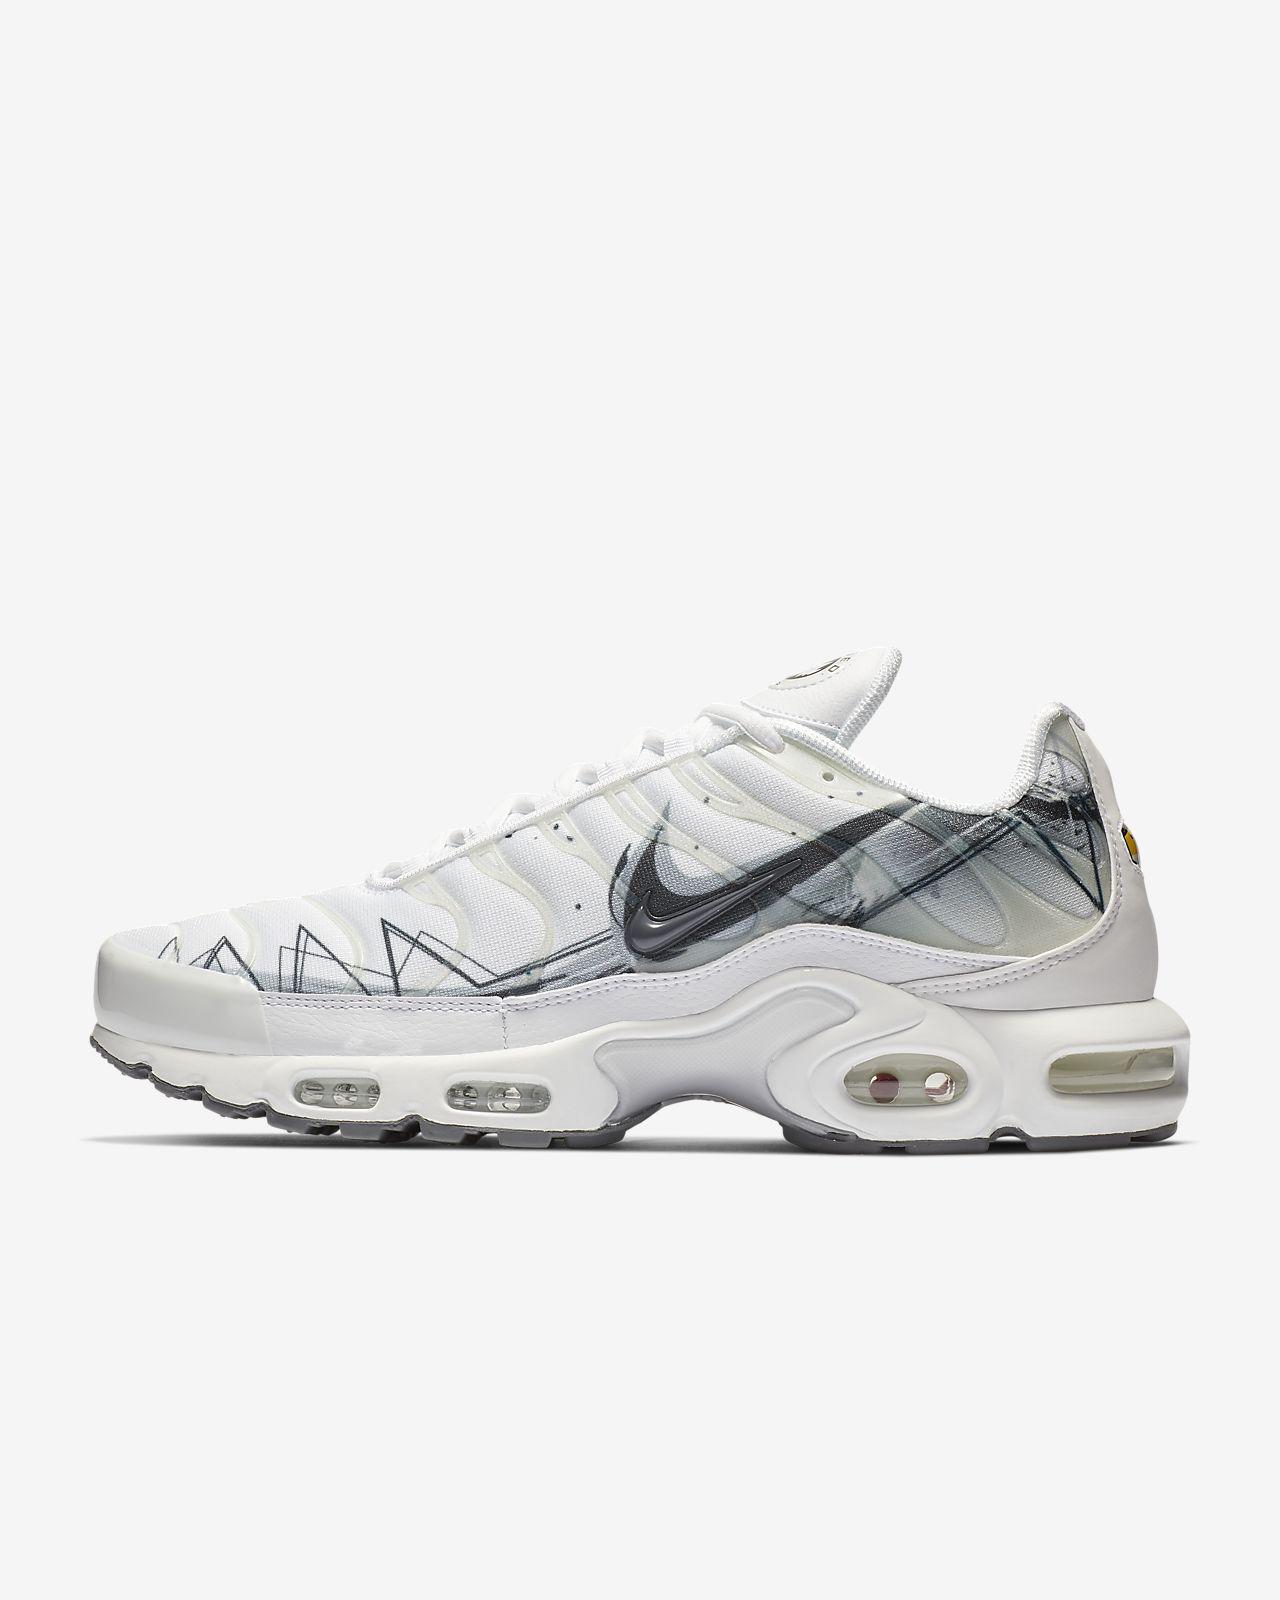 on sale f8e41 72fb0 ... Nike Air Max Plus-sko (mænd)